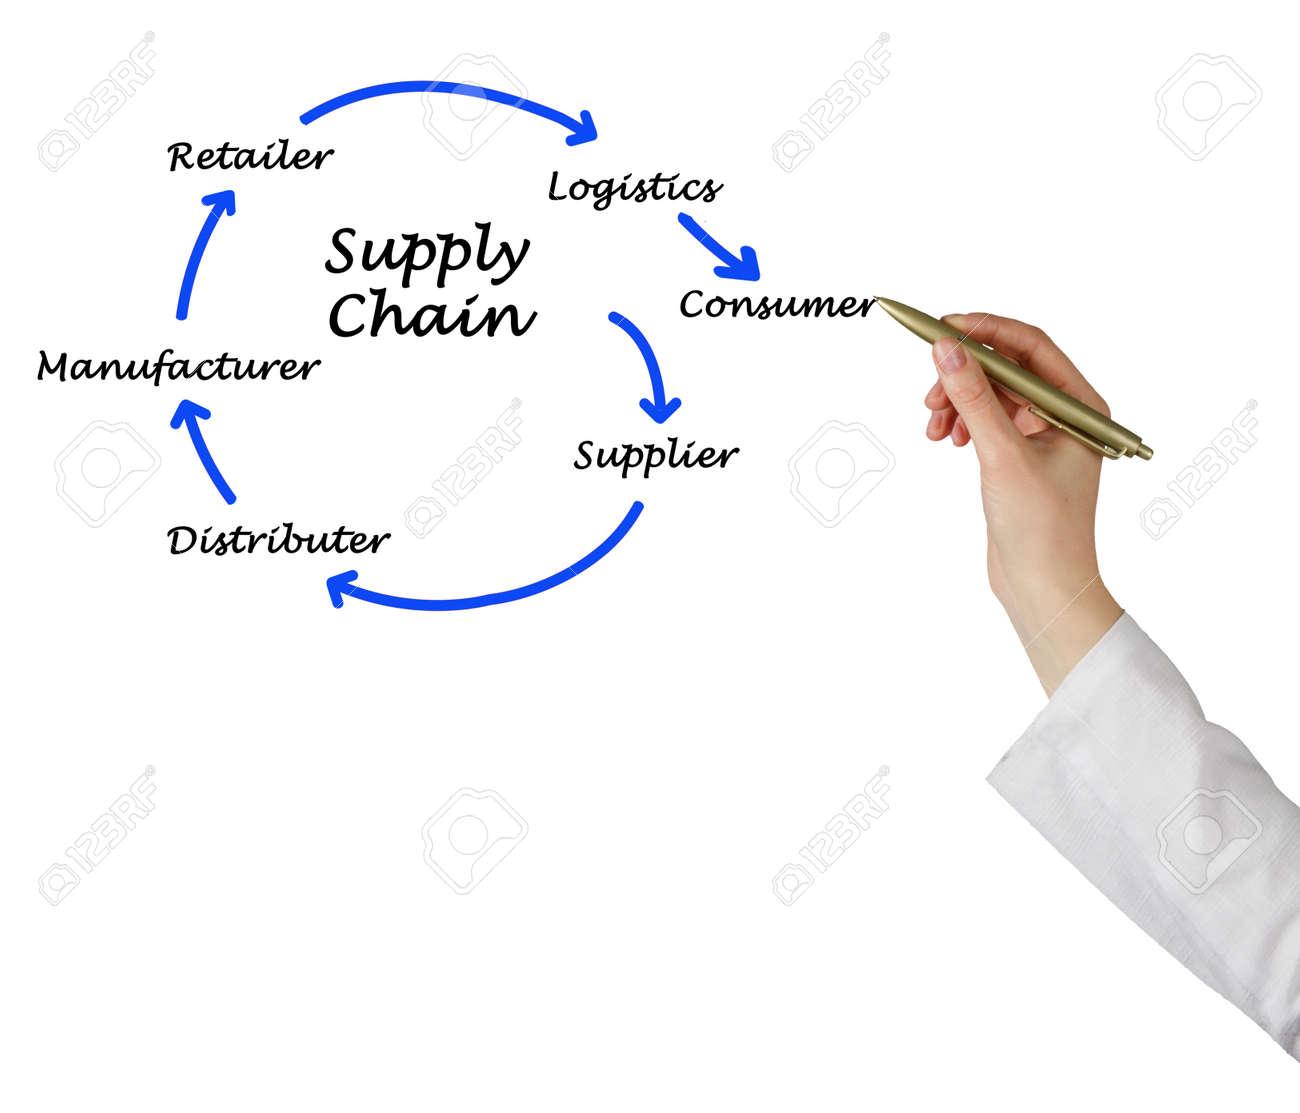 Supply Chain Management - 167898245